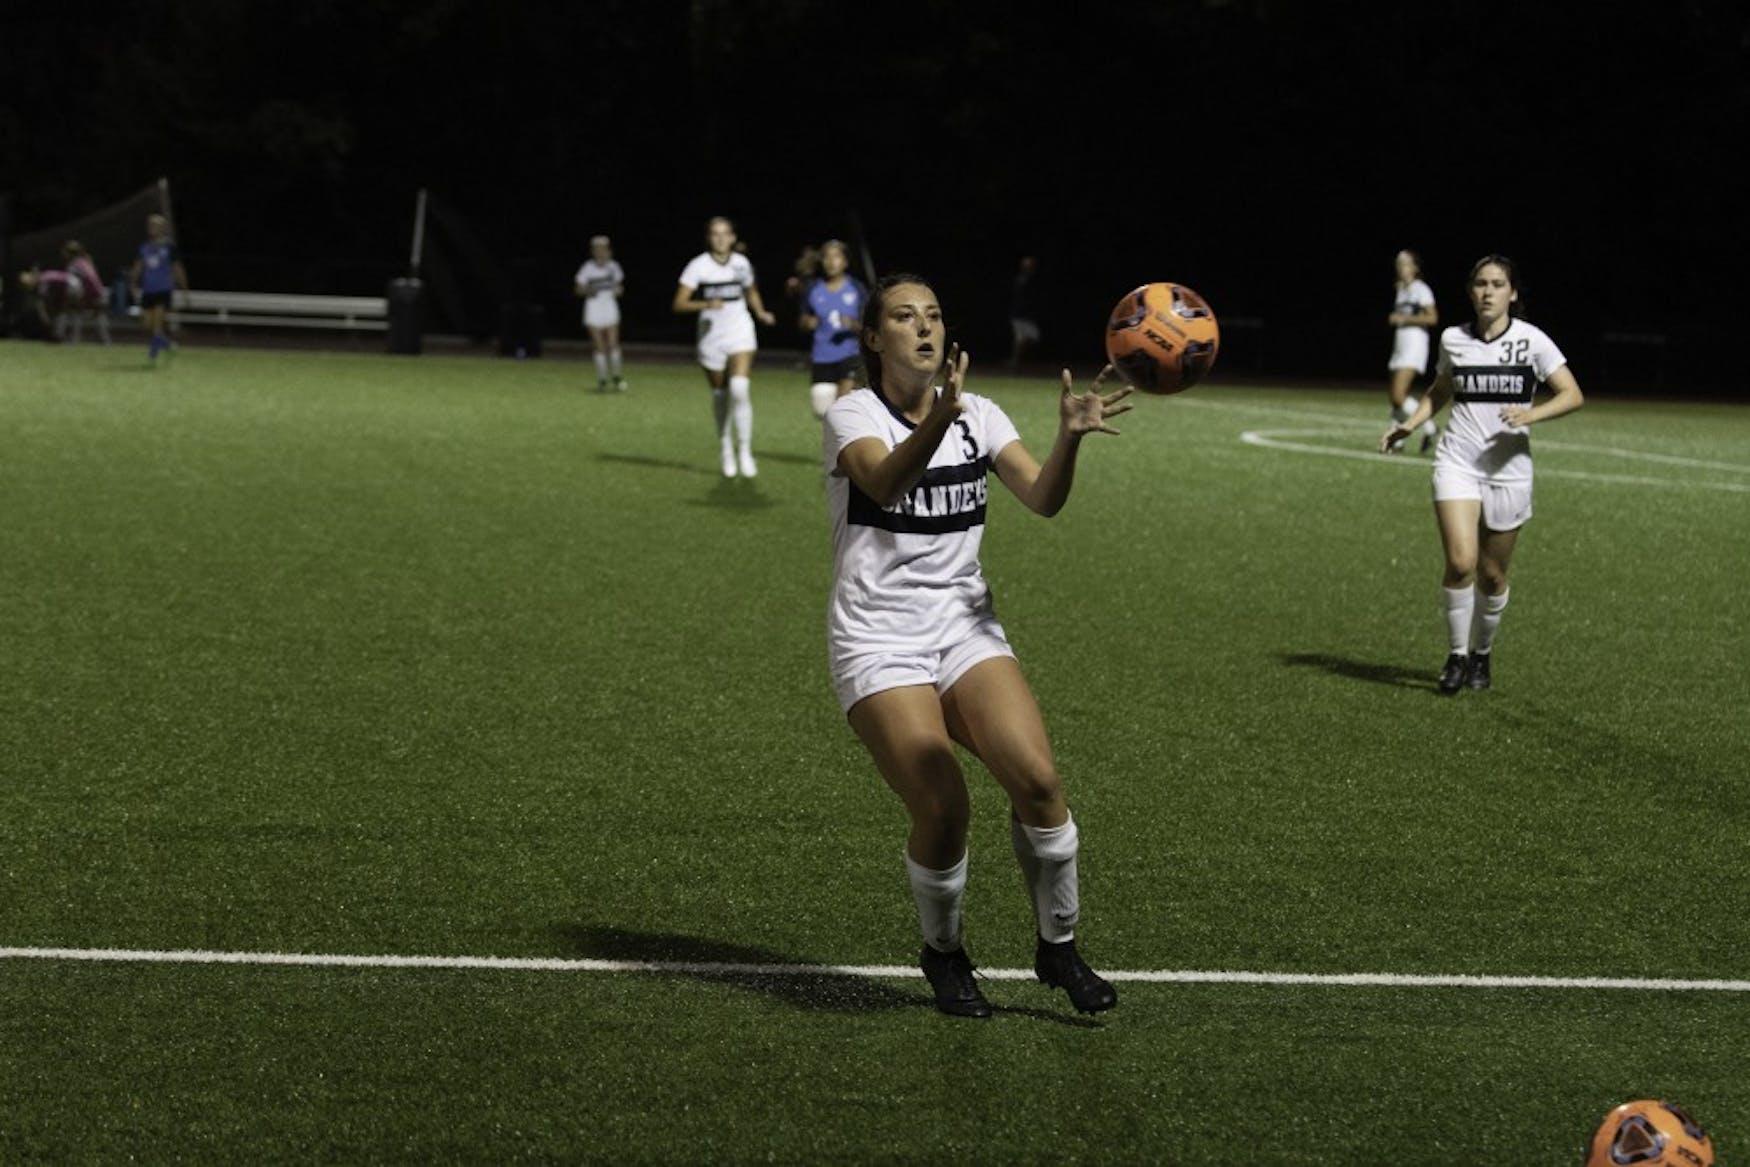 soccerw-9-24-19-nz-0108